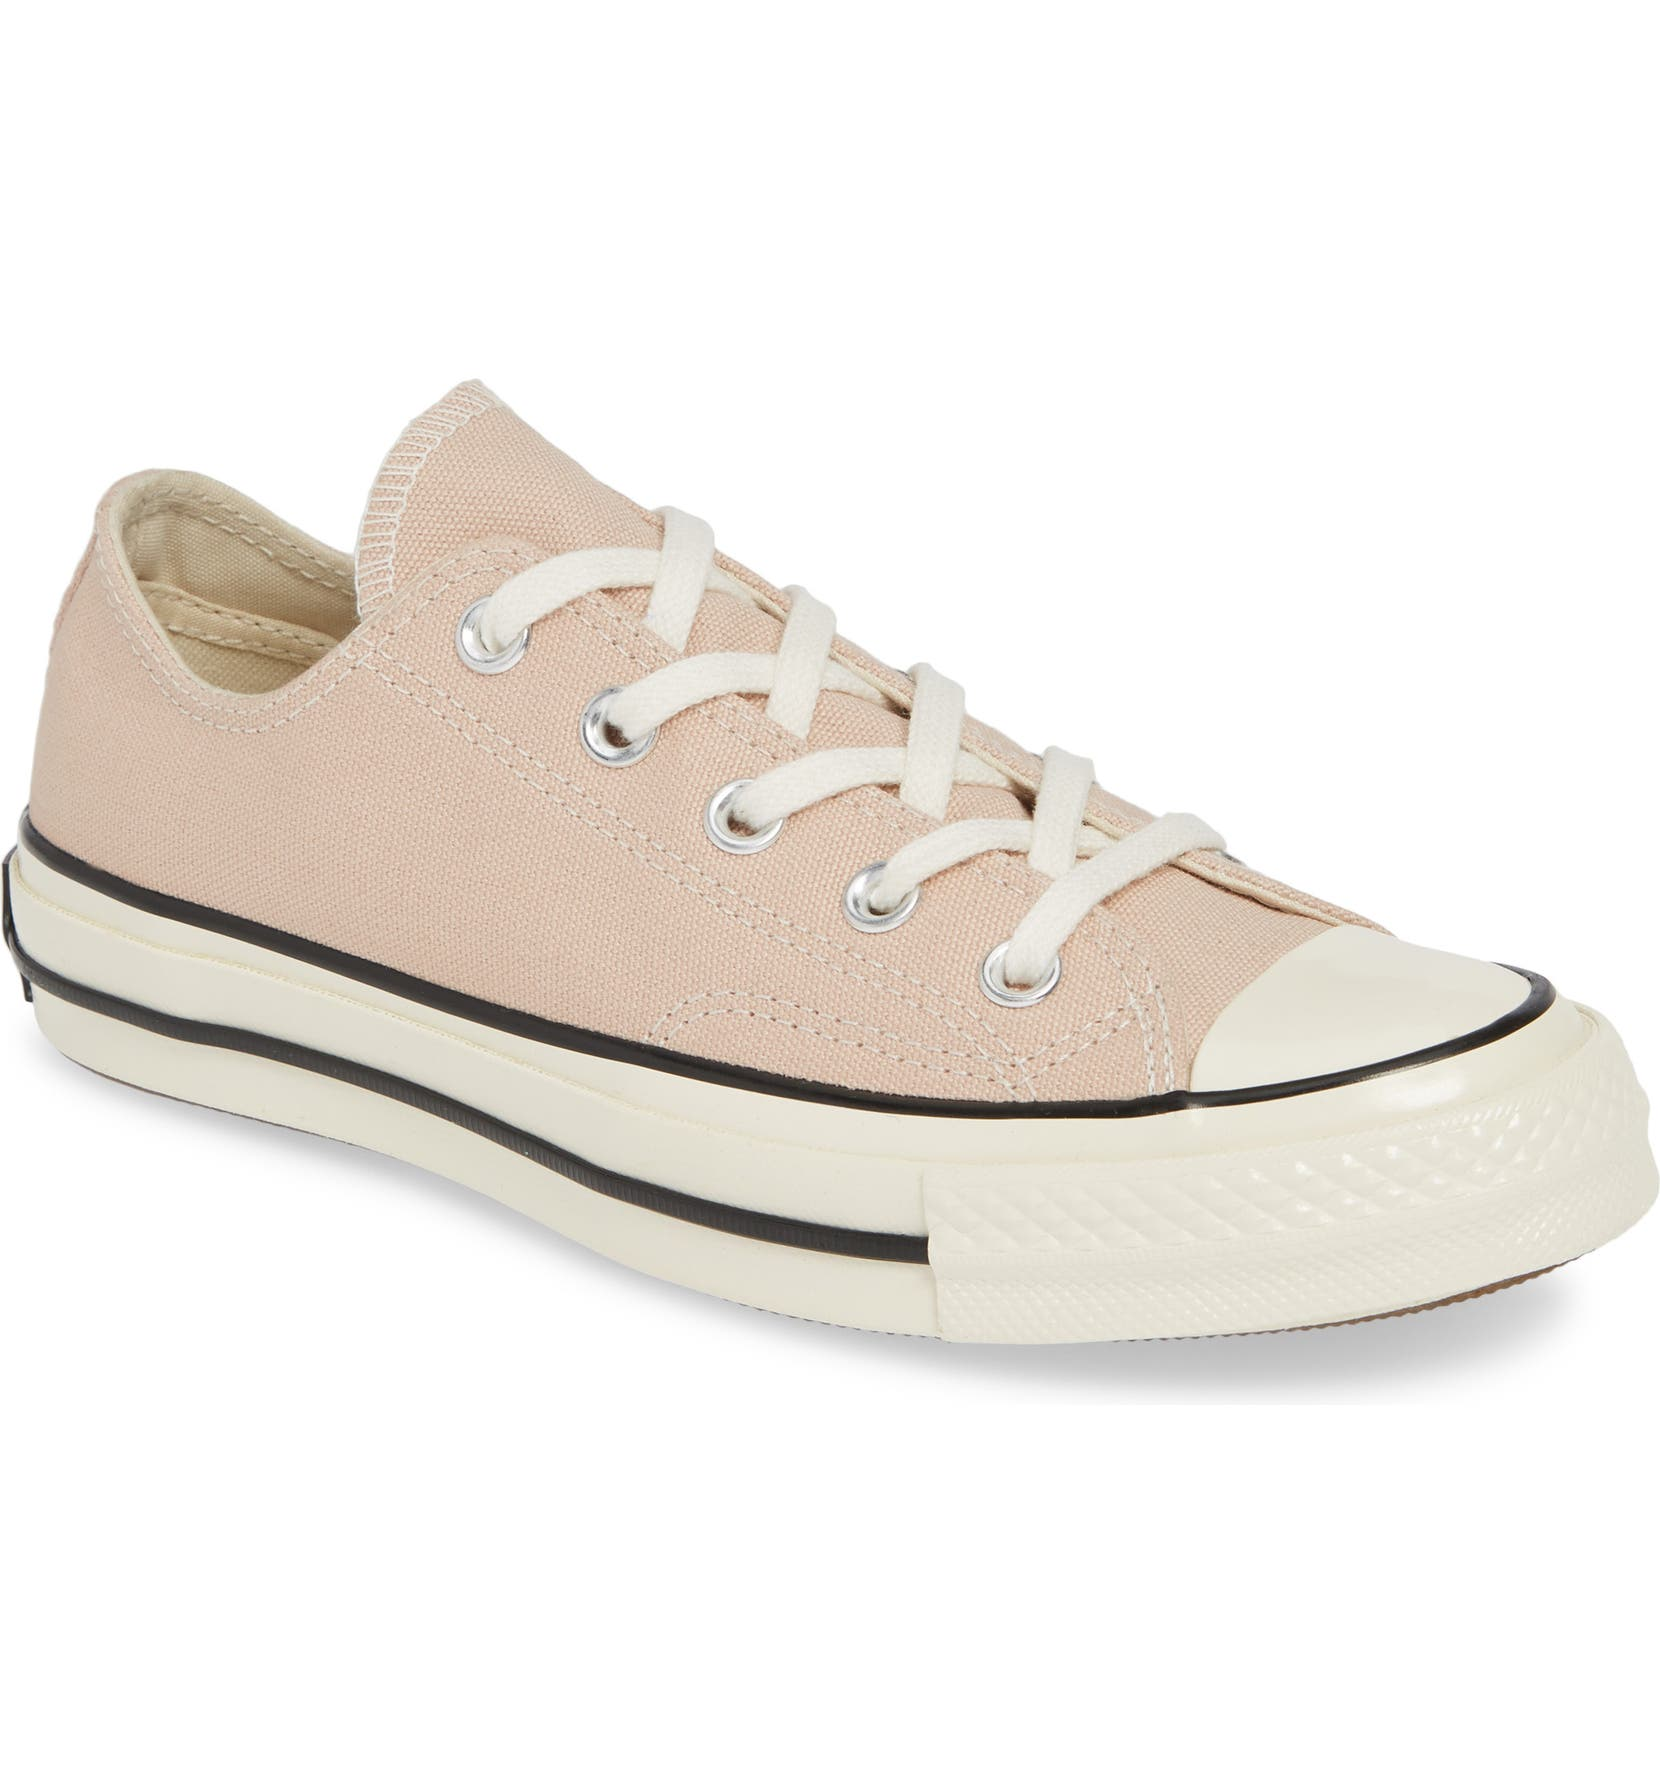 Converse Chuck Taylor AS |70 OX Sneaker Beige